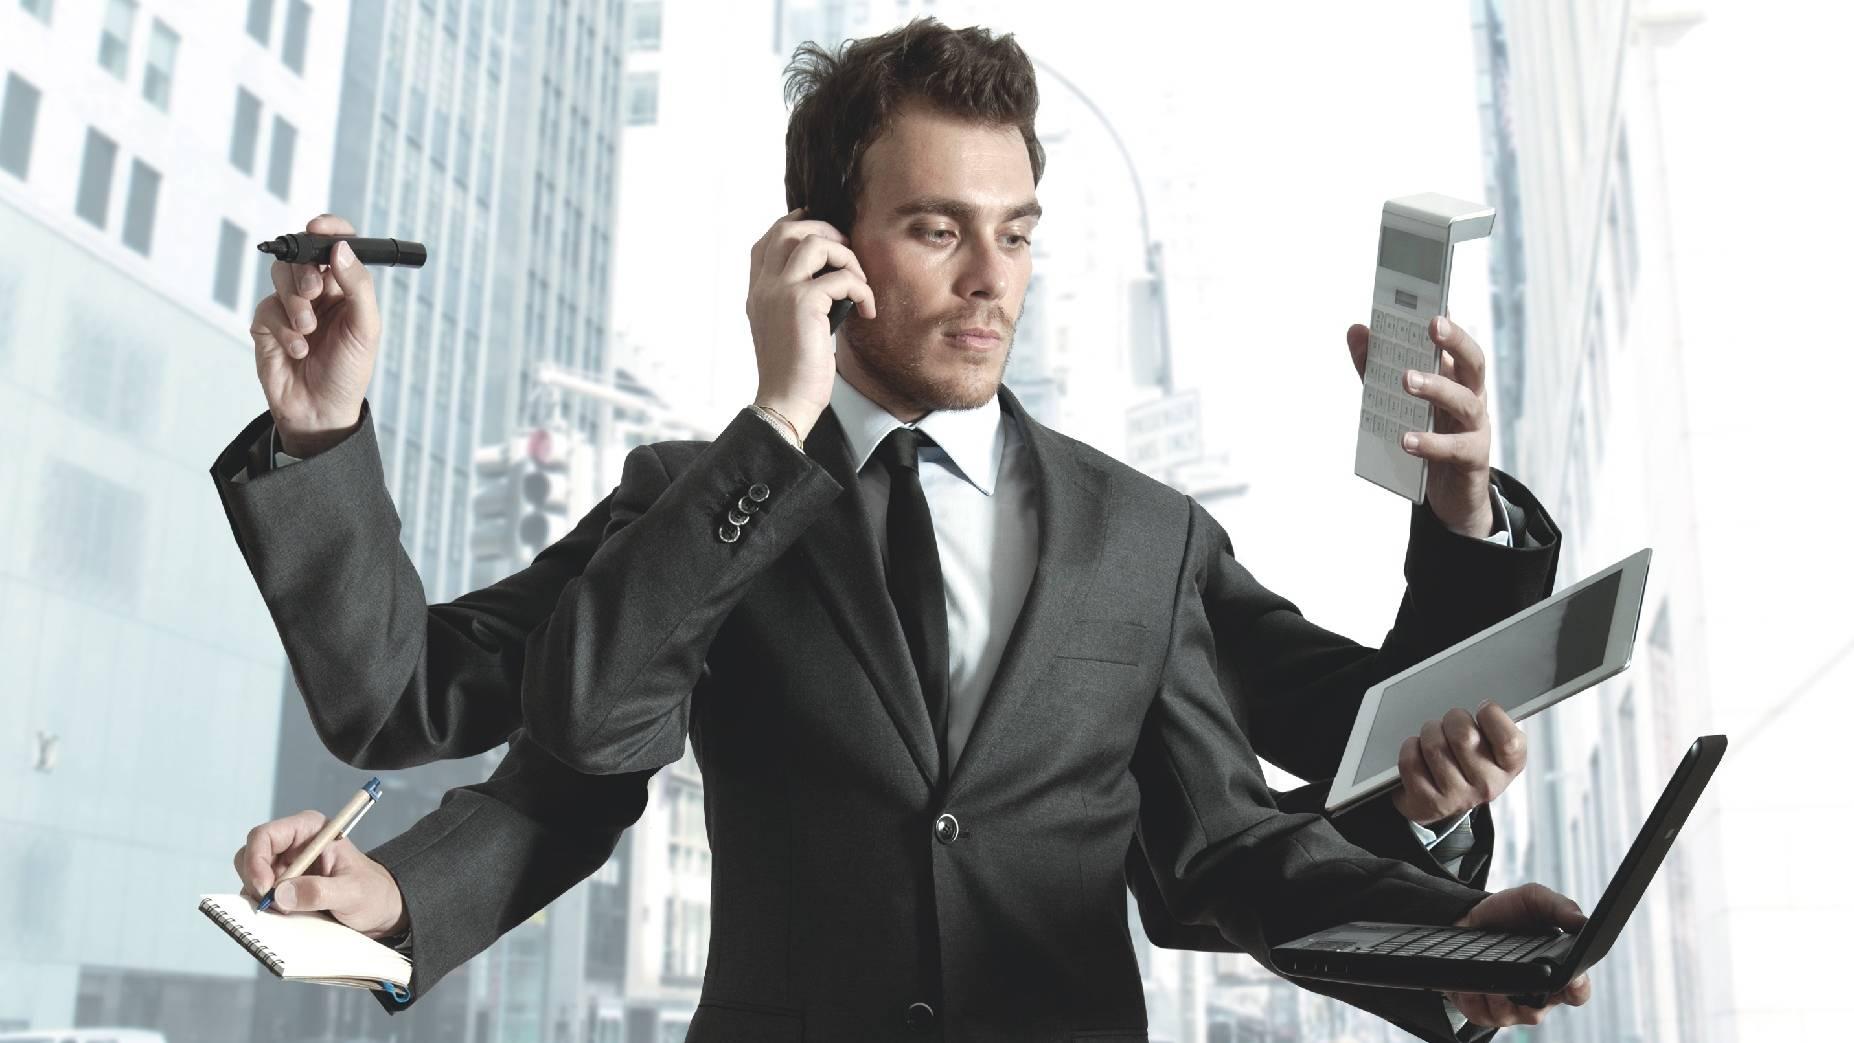 agile automations manager multitasking